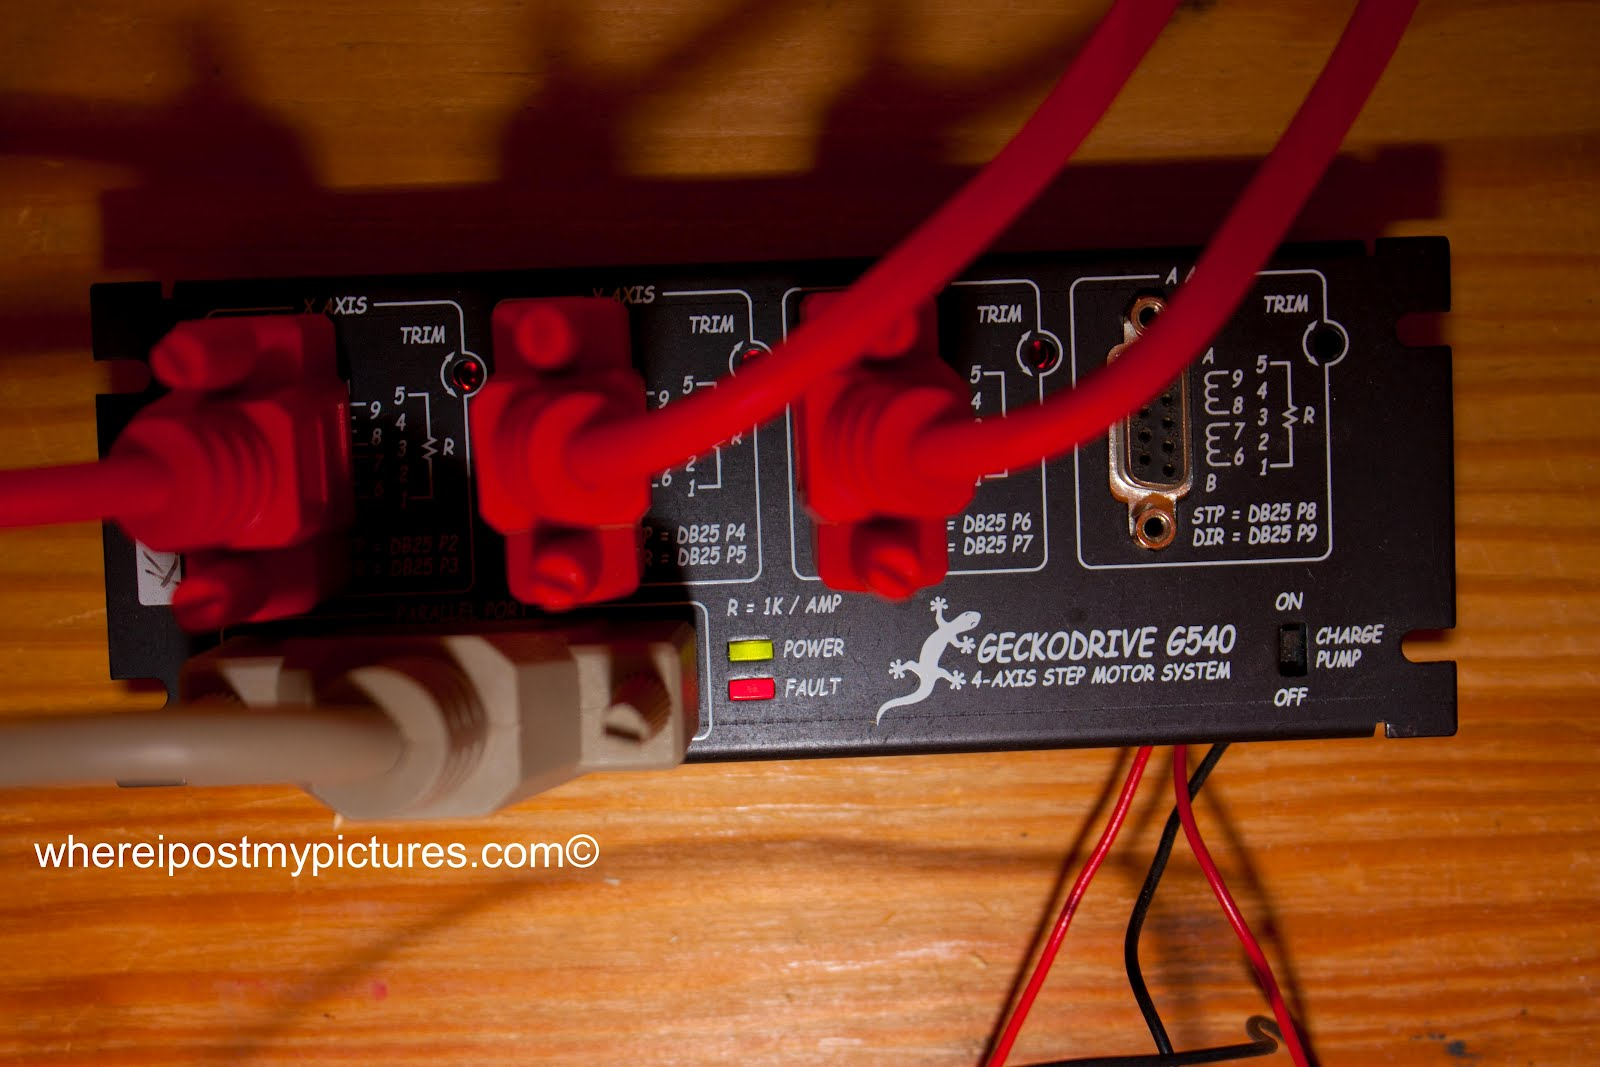 Usb Armpod Pinout For Gecko G540 Controller Campod Breakout Board Cnc Machine Control Limit Switch Wiring